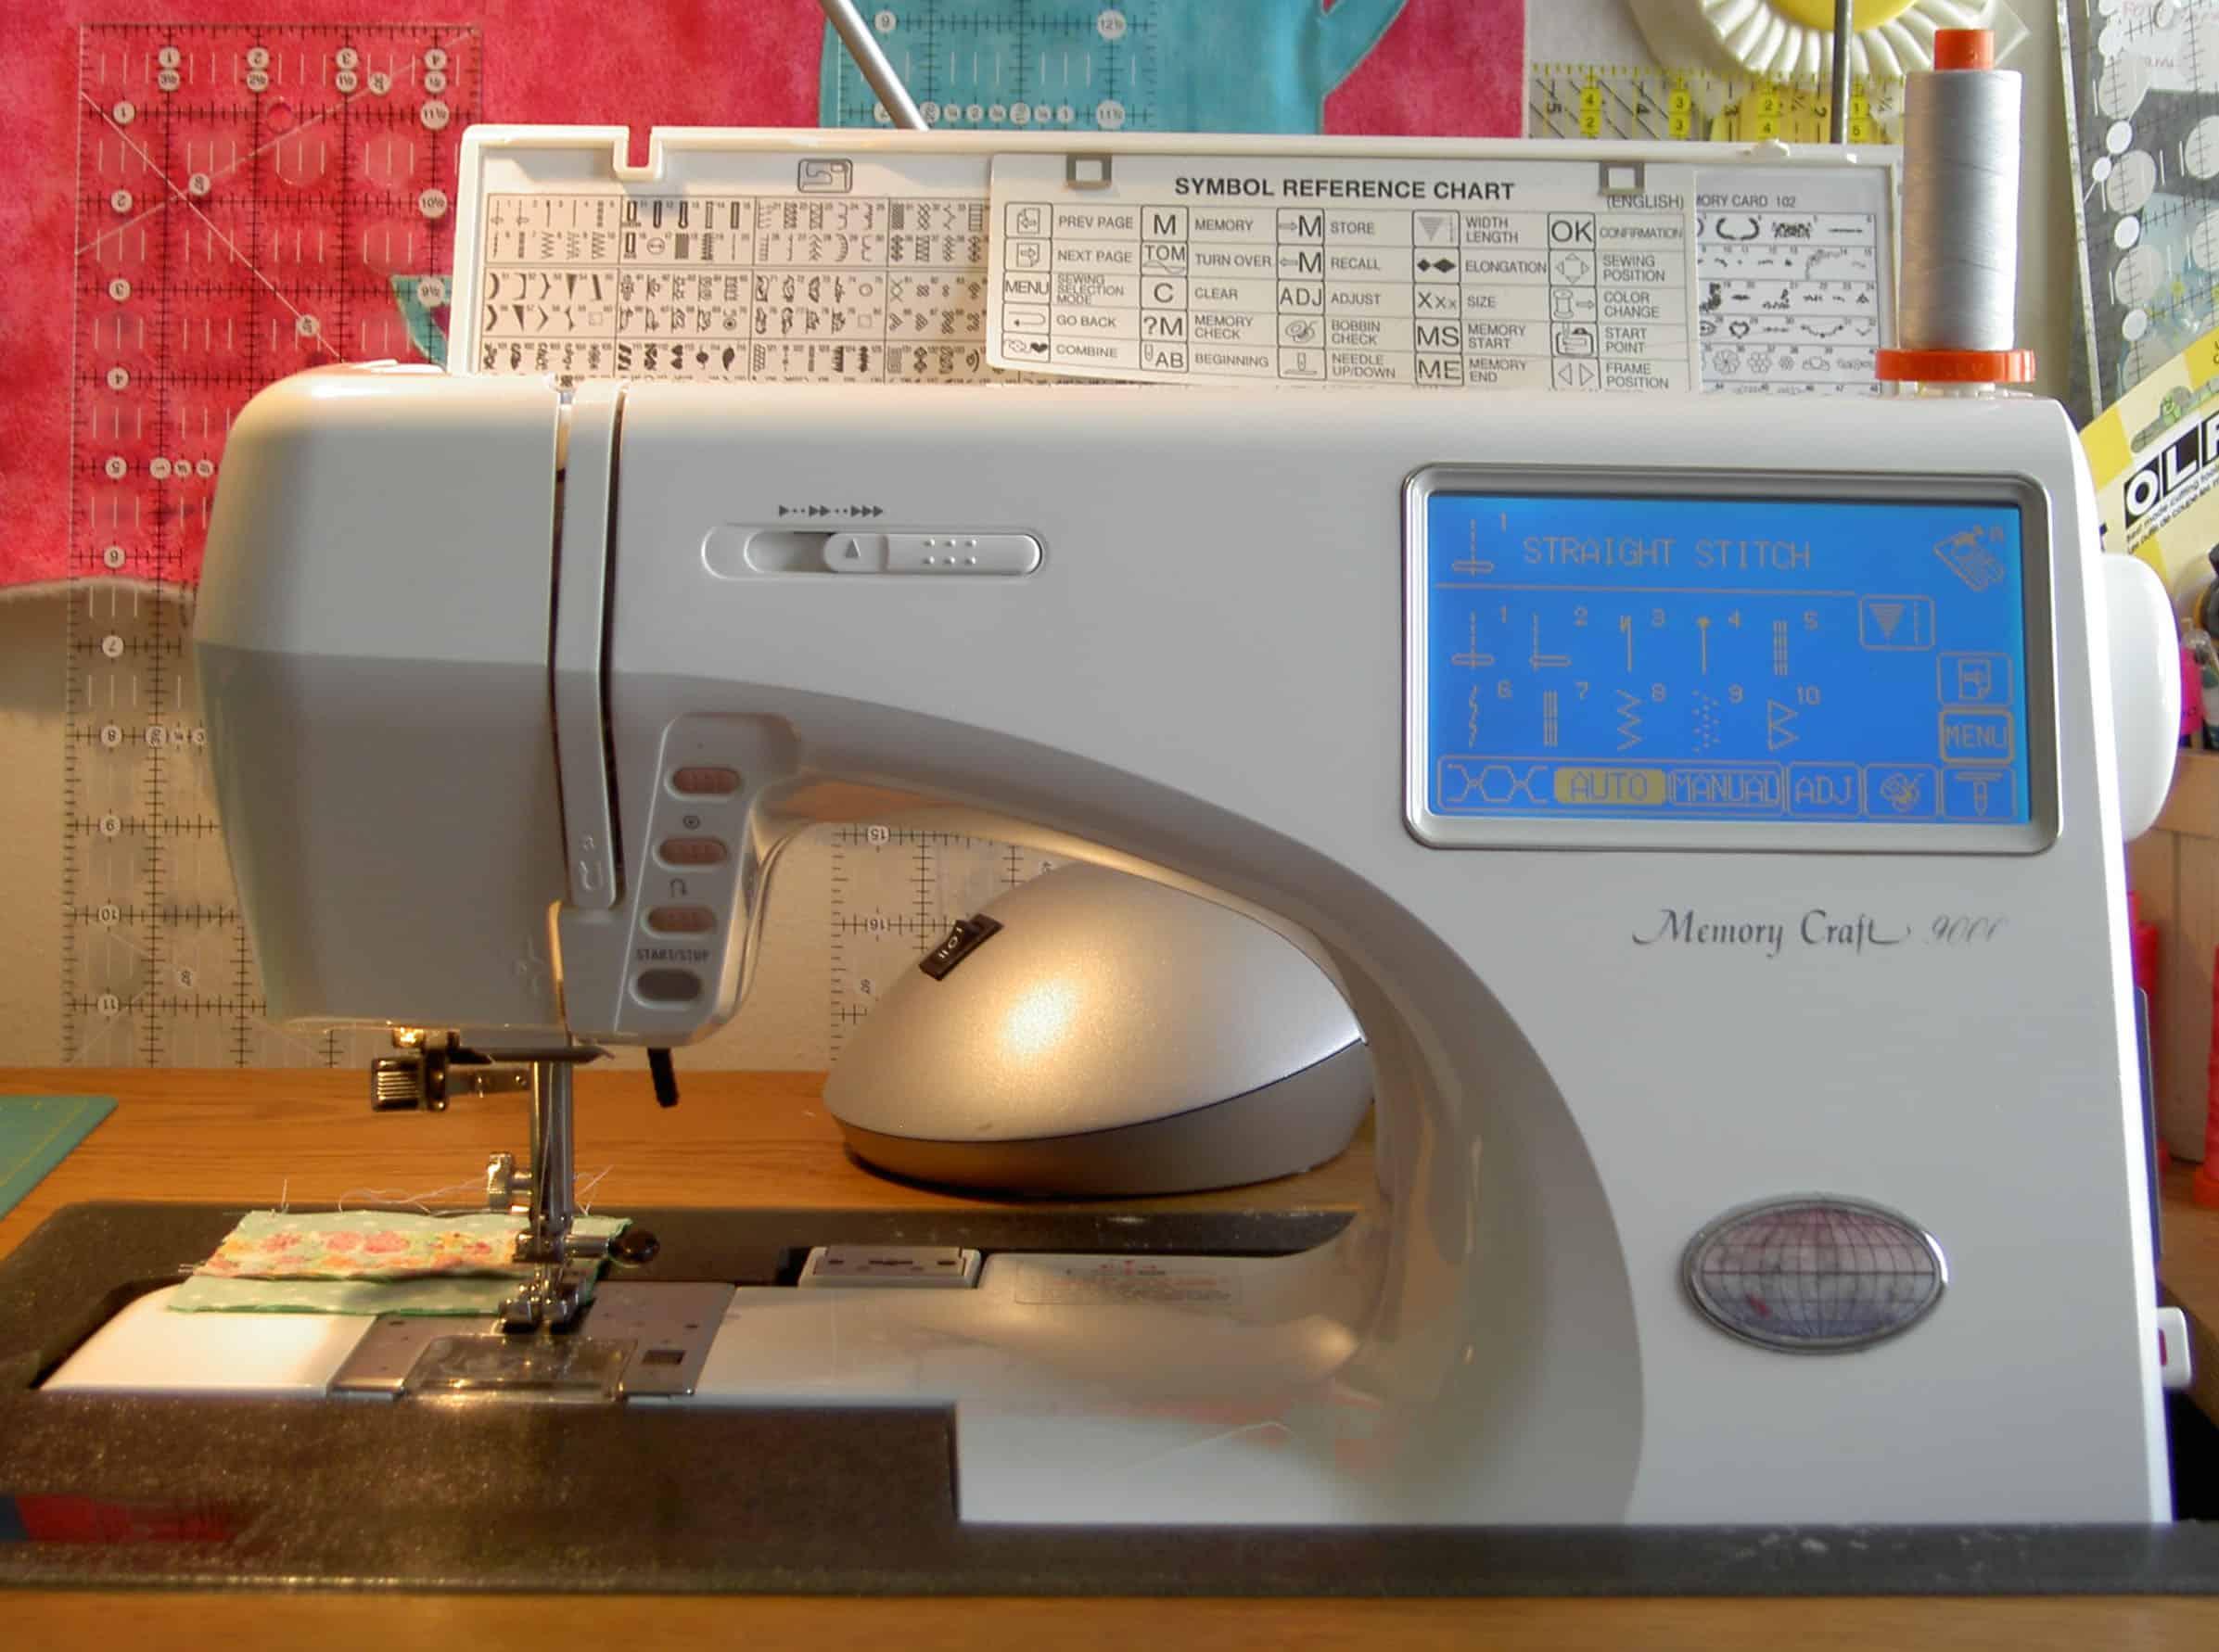 Janome memory craft 9000 - Janome 9000